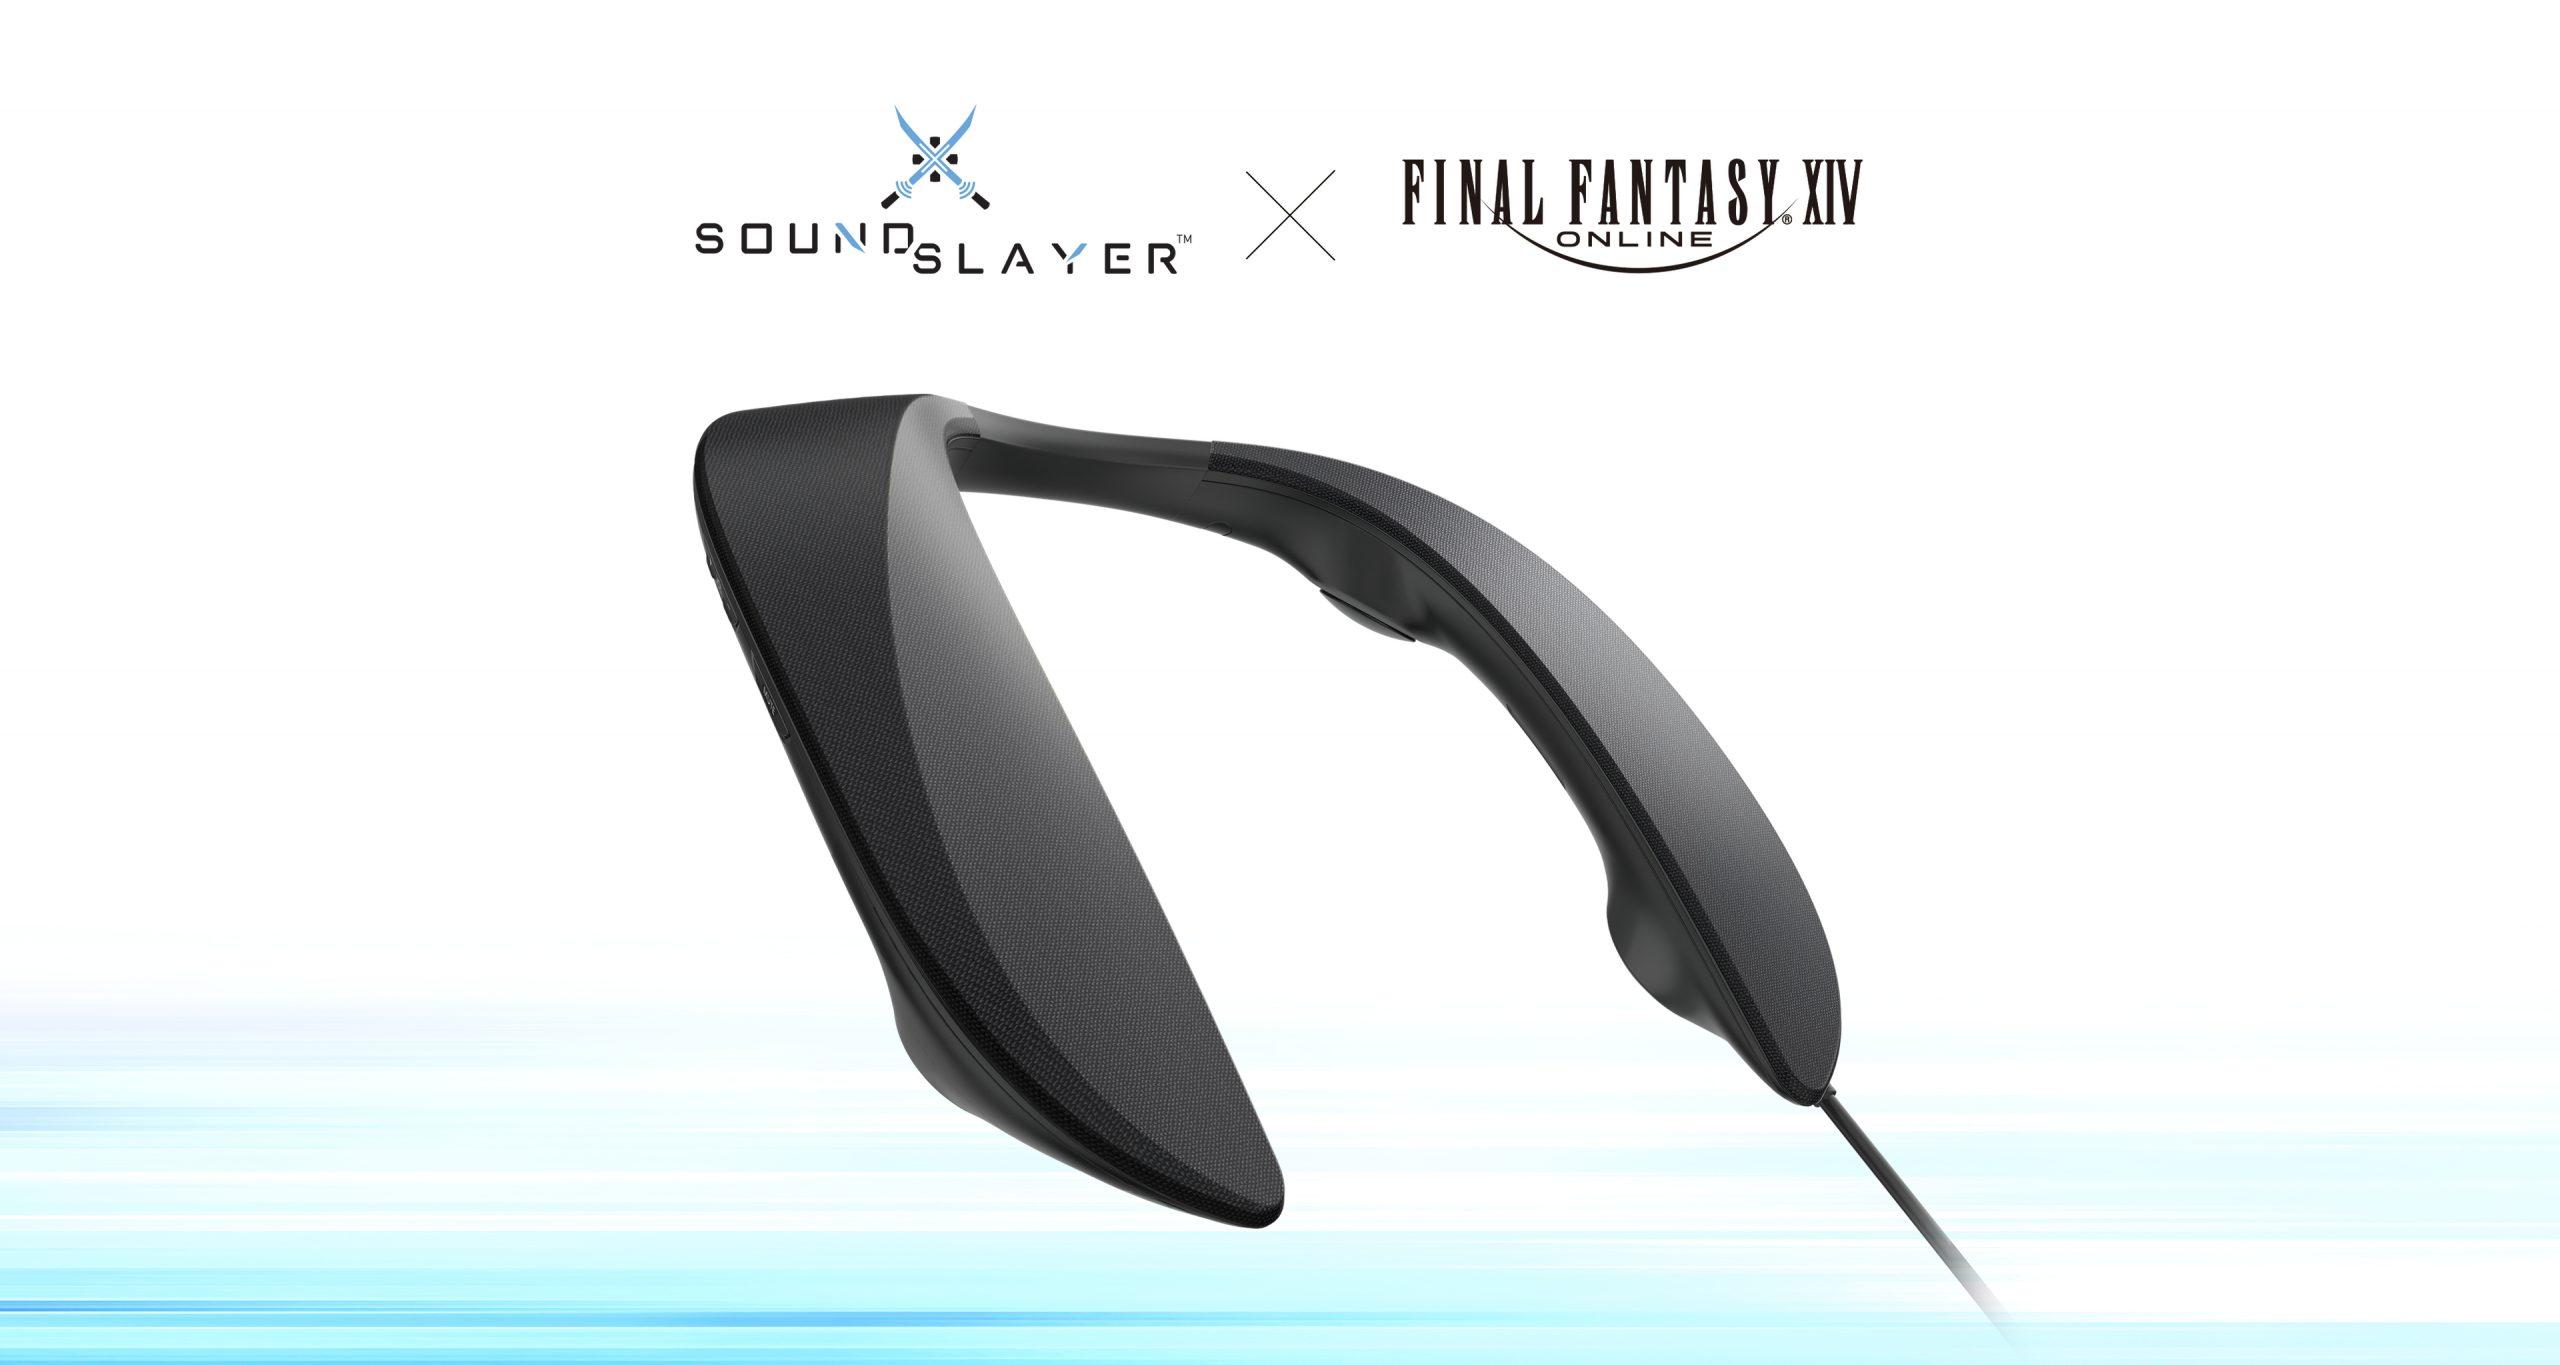 Panasonic GN01 final fantasy soundslayer-L&B scaled